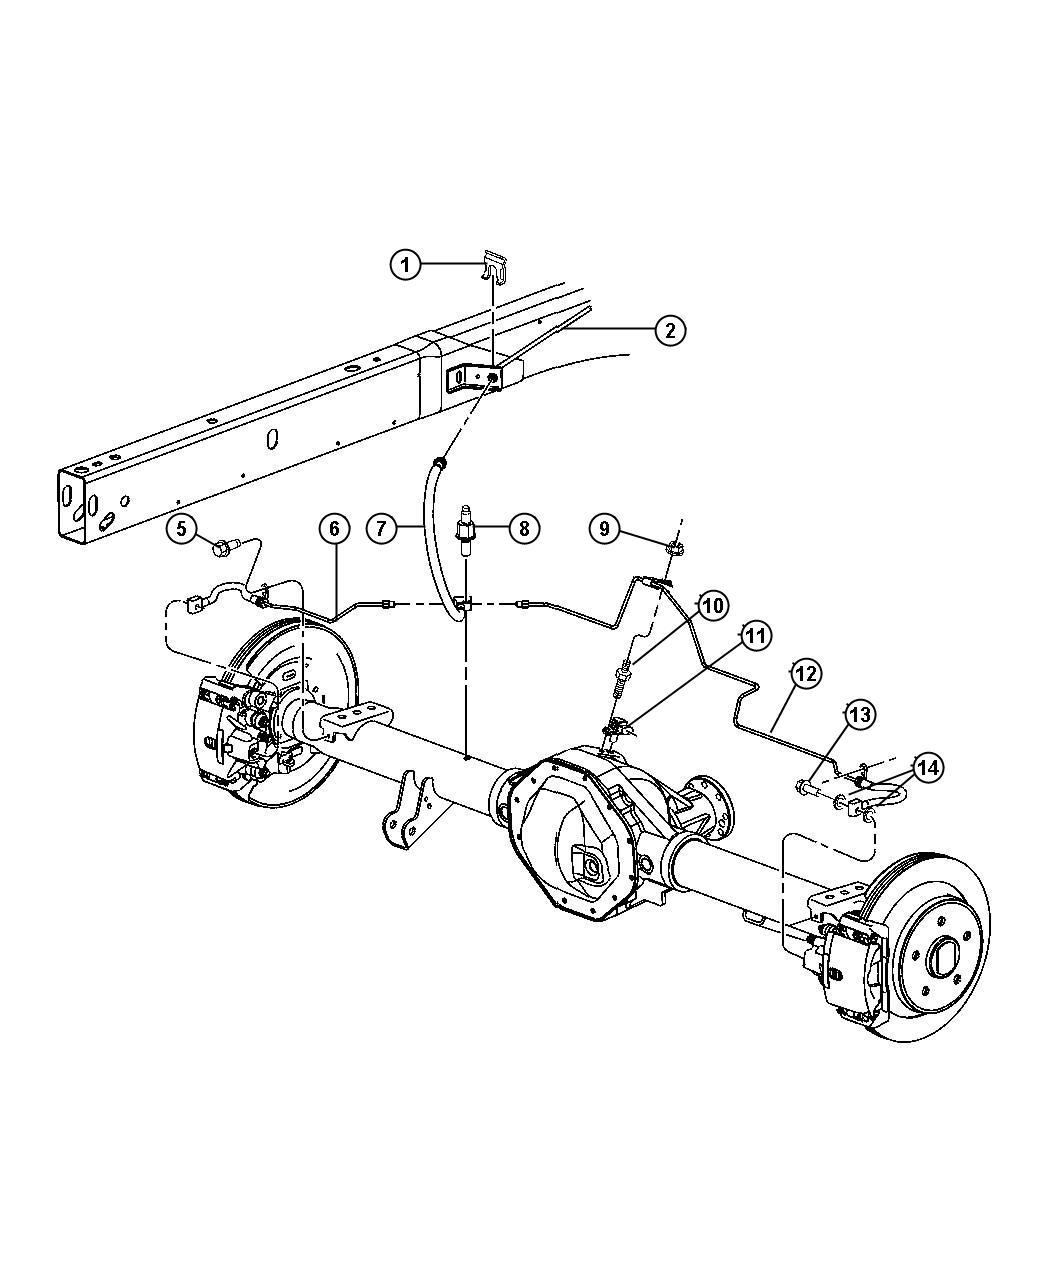 Dodge Ram Parking Brake Diagram Sketch Coloring Page